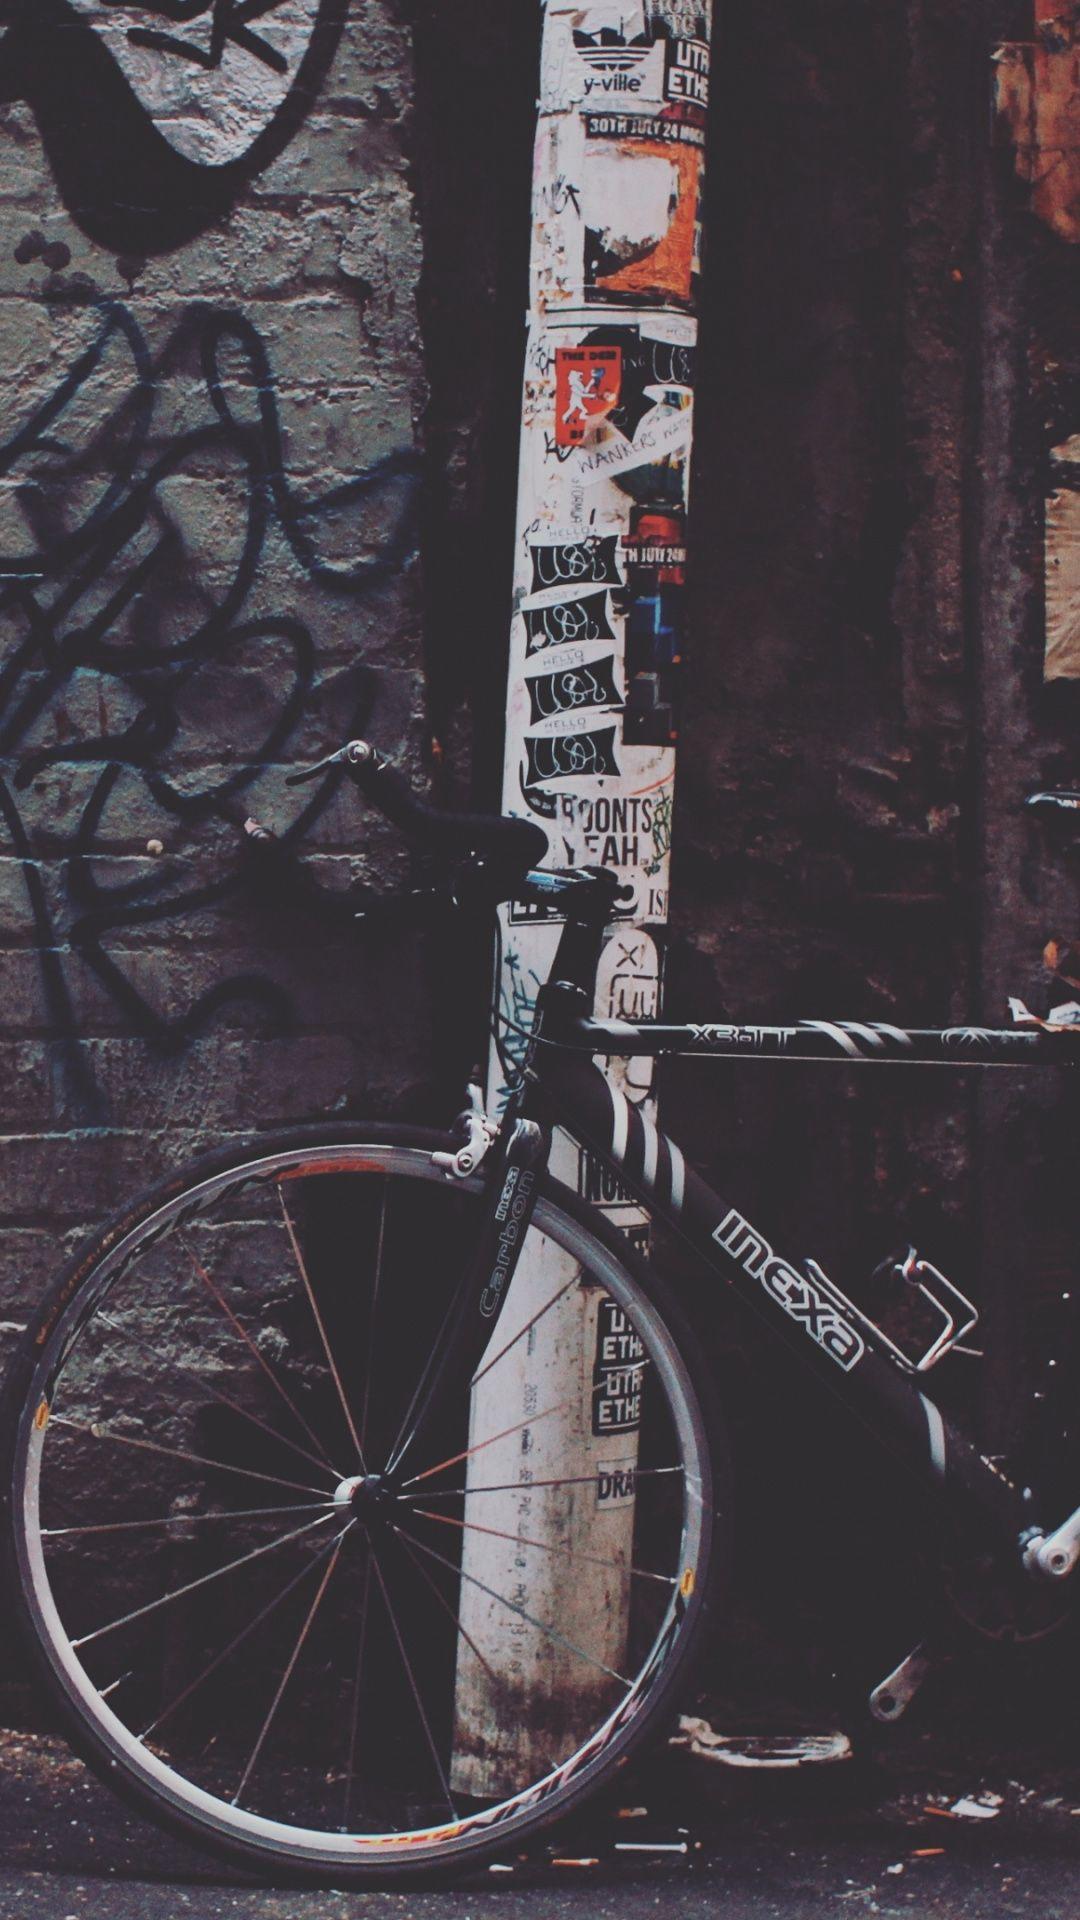 Wallpapers Street Art Mountain Bike Bicycle Frame Graffiti Tree